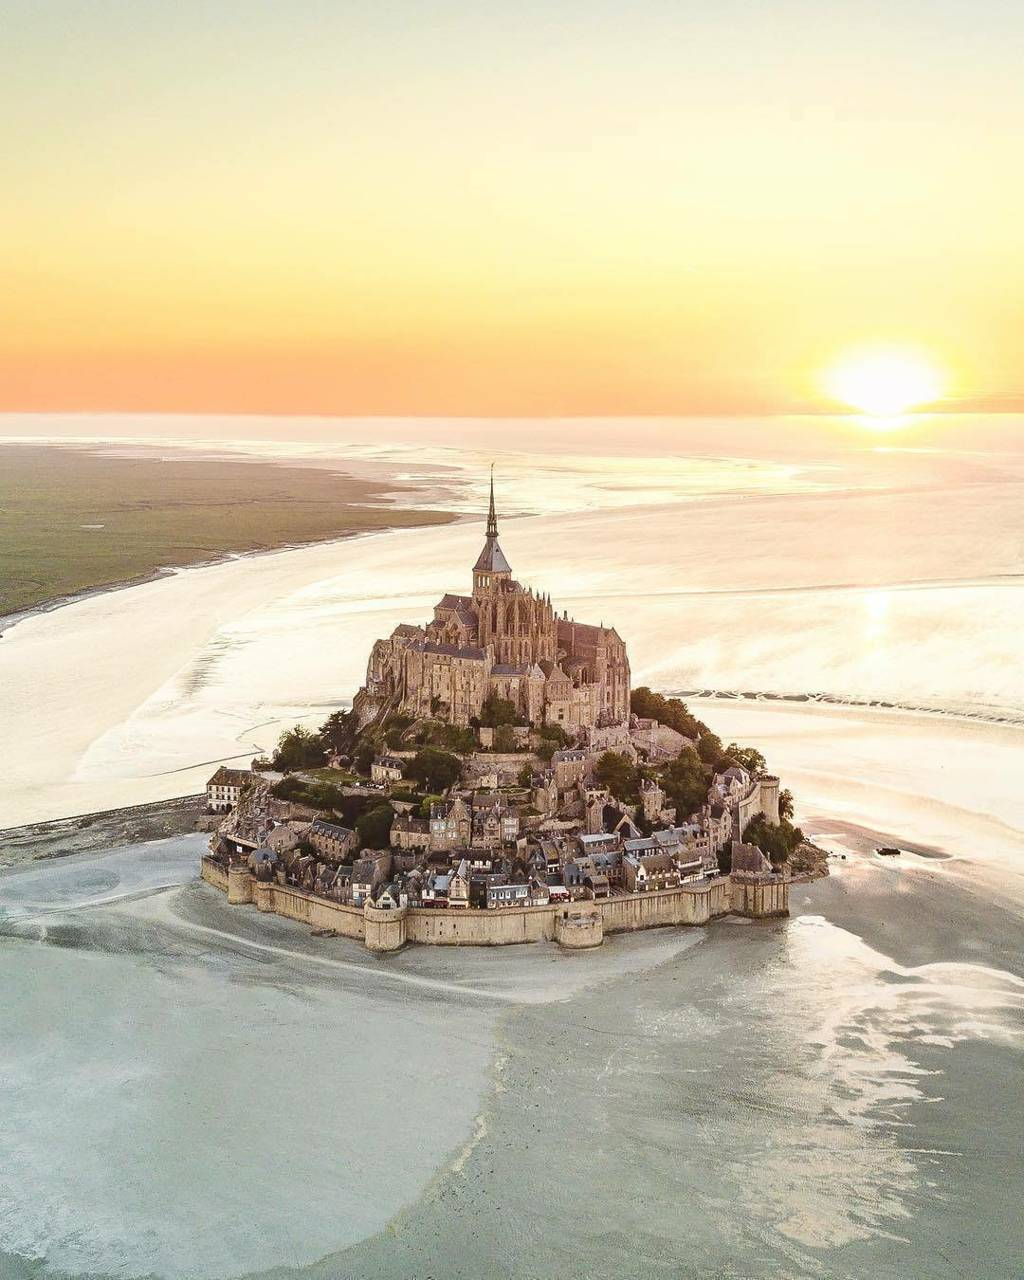 Mont Saint Michel Wallpaper By Tubar 37 Free On Zedge